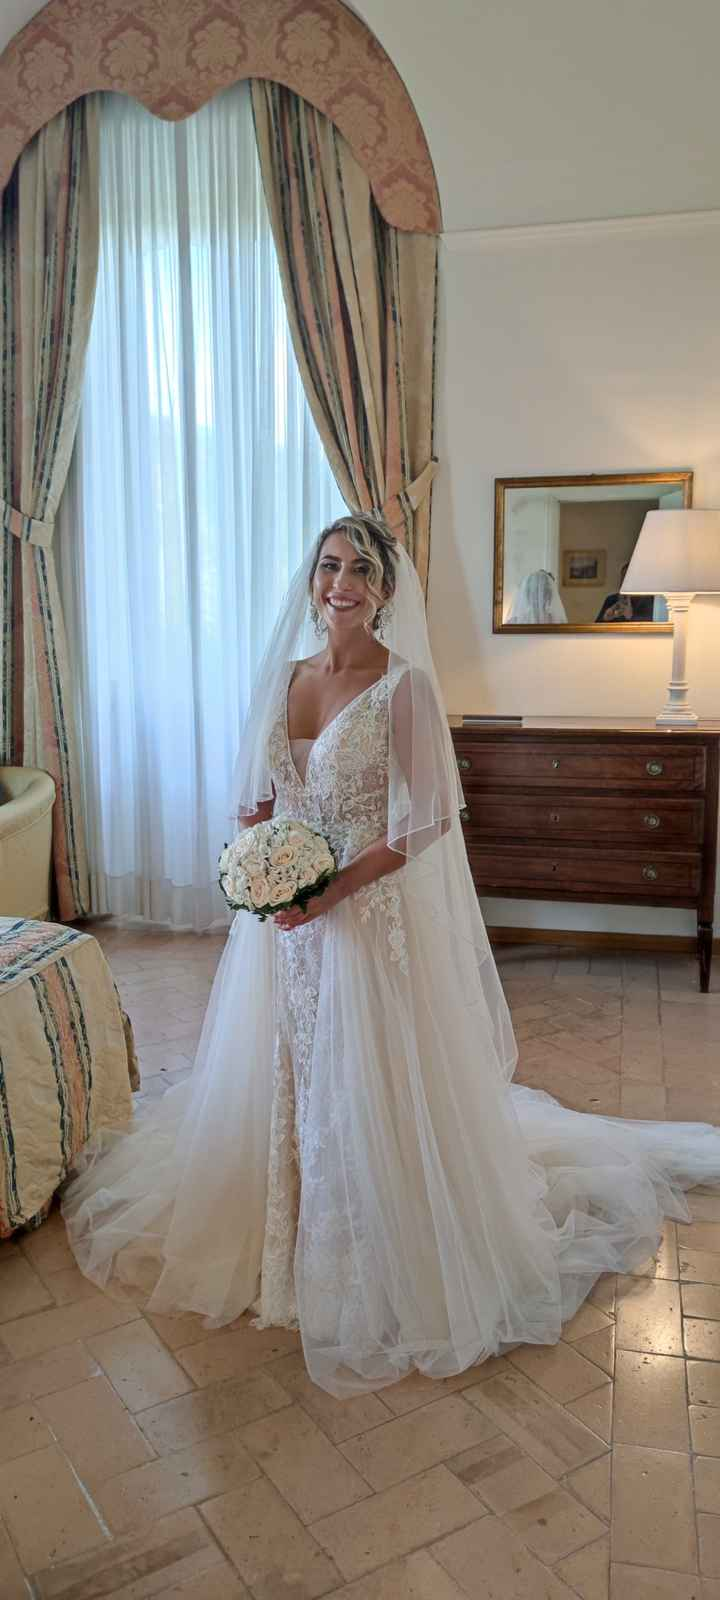 Abito da sposa dual dress - 1